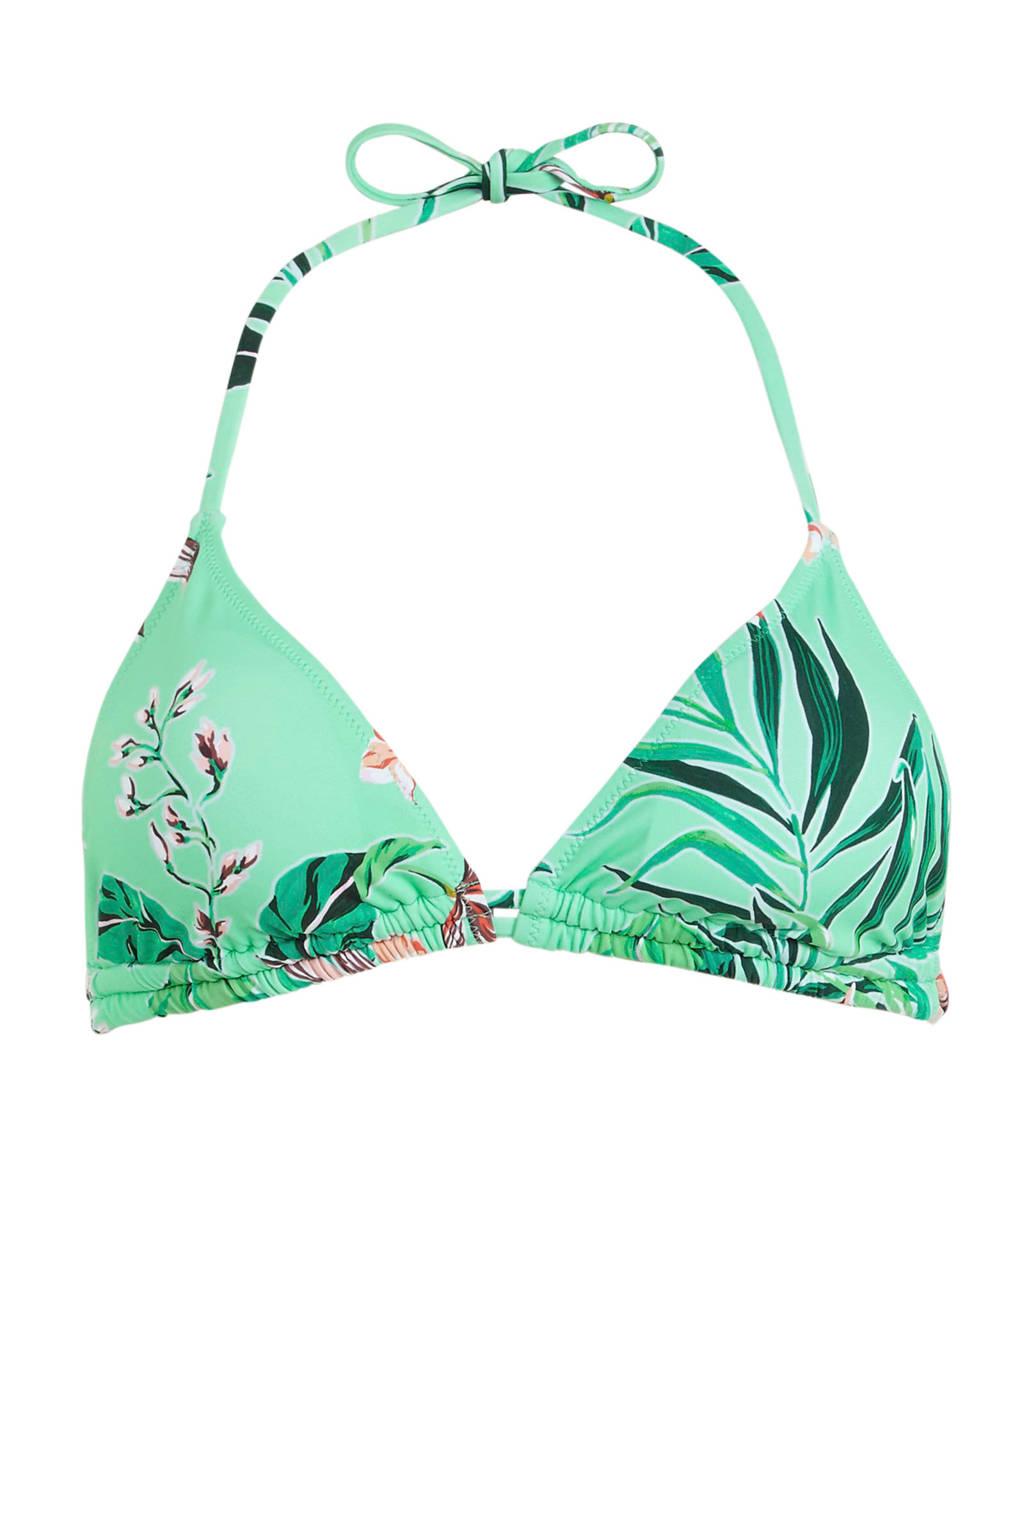 Shiwi gebloemde triangel bikinitop turquoise/roze, Turquoise/roze/oranje